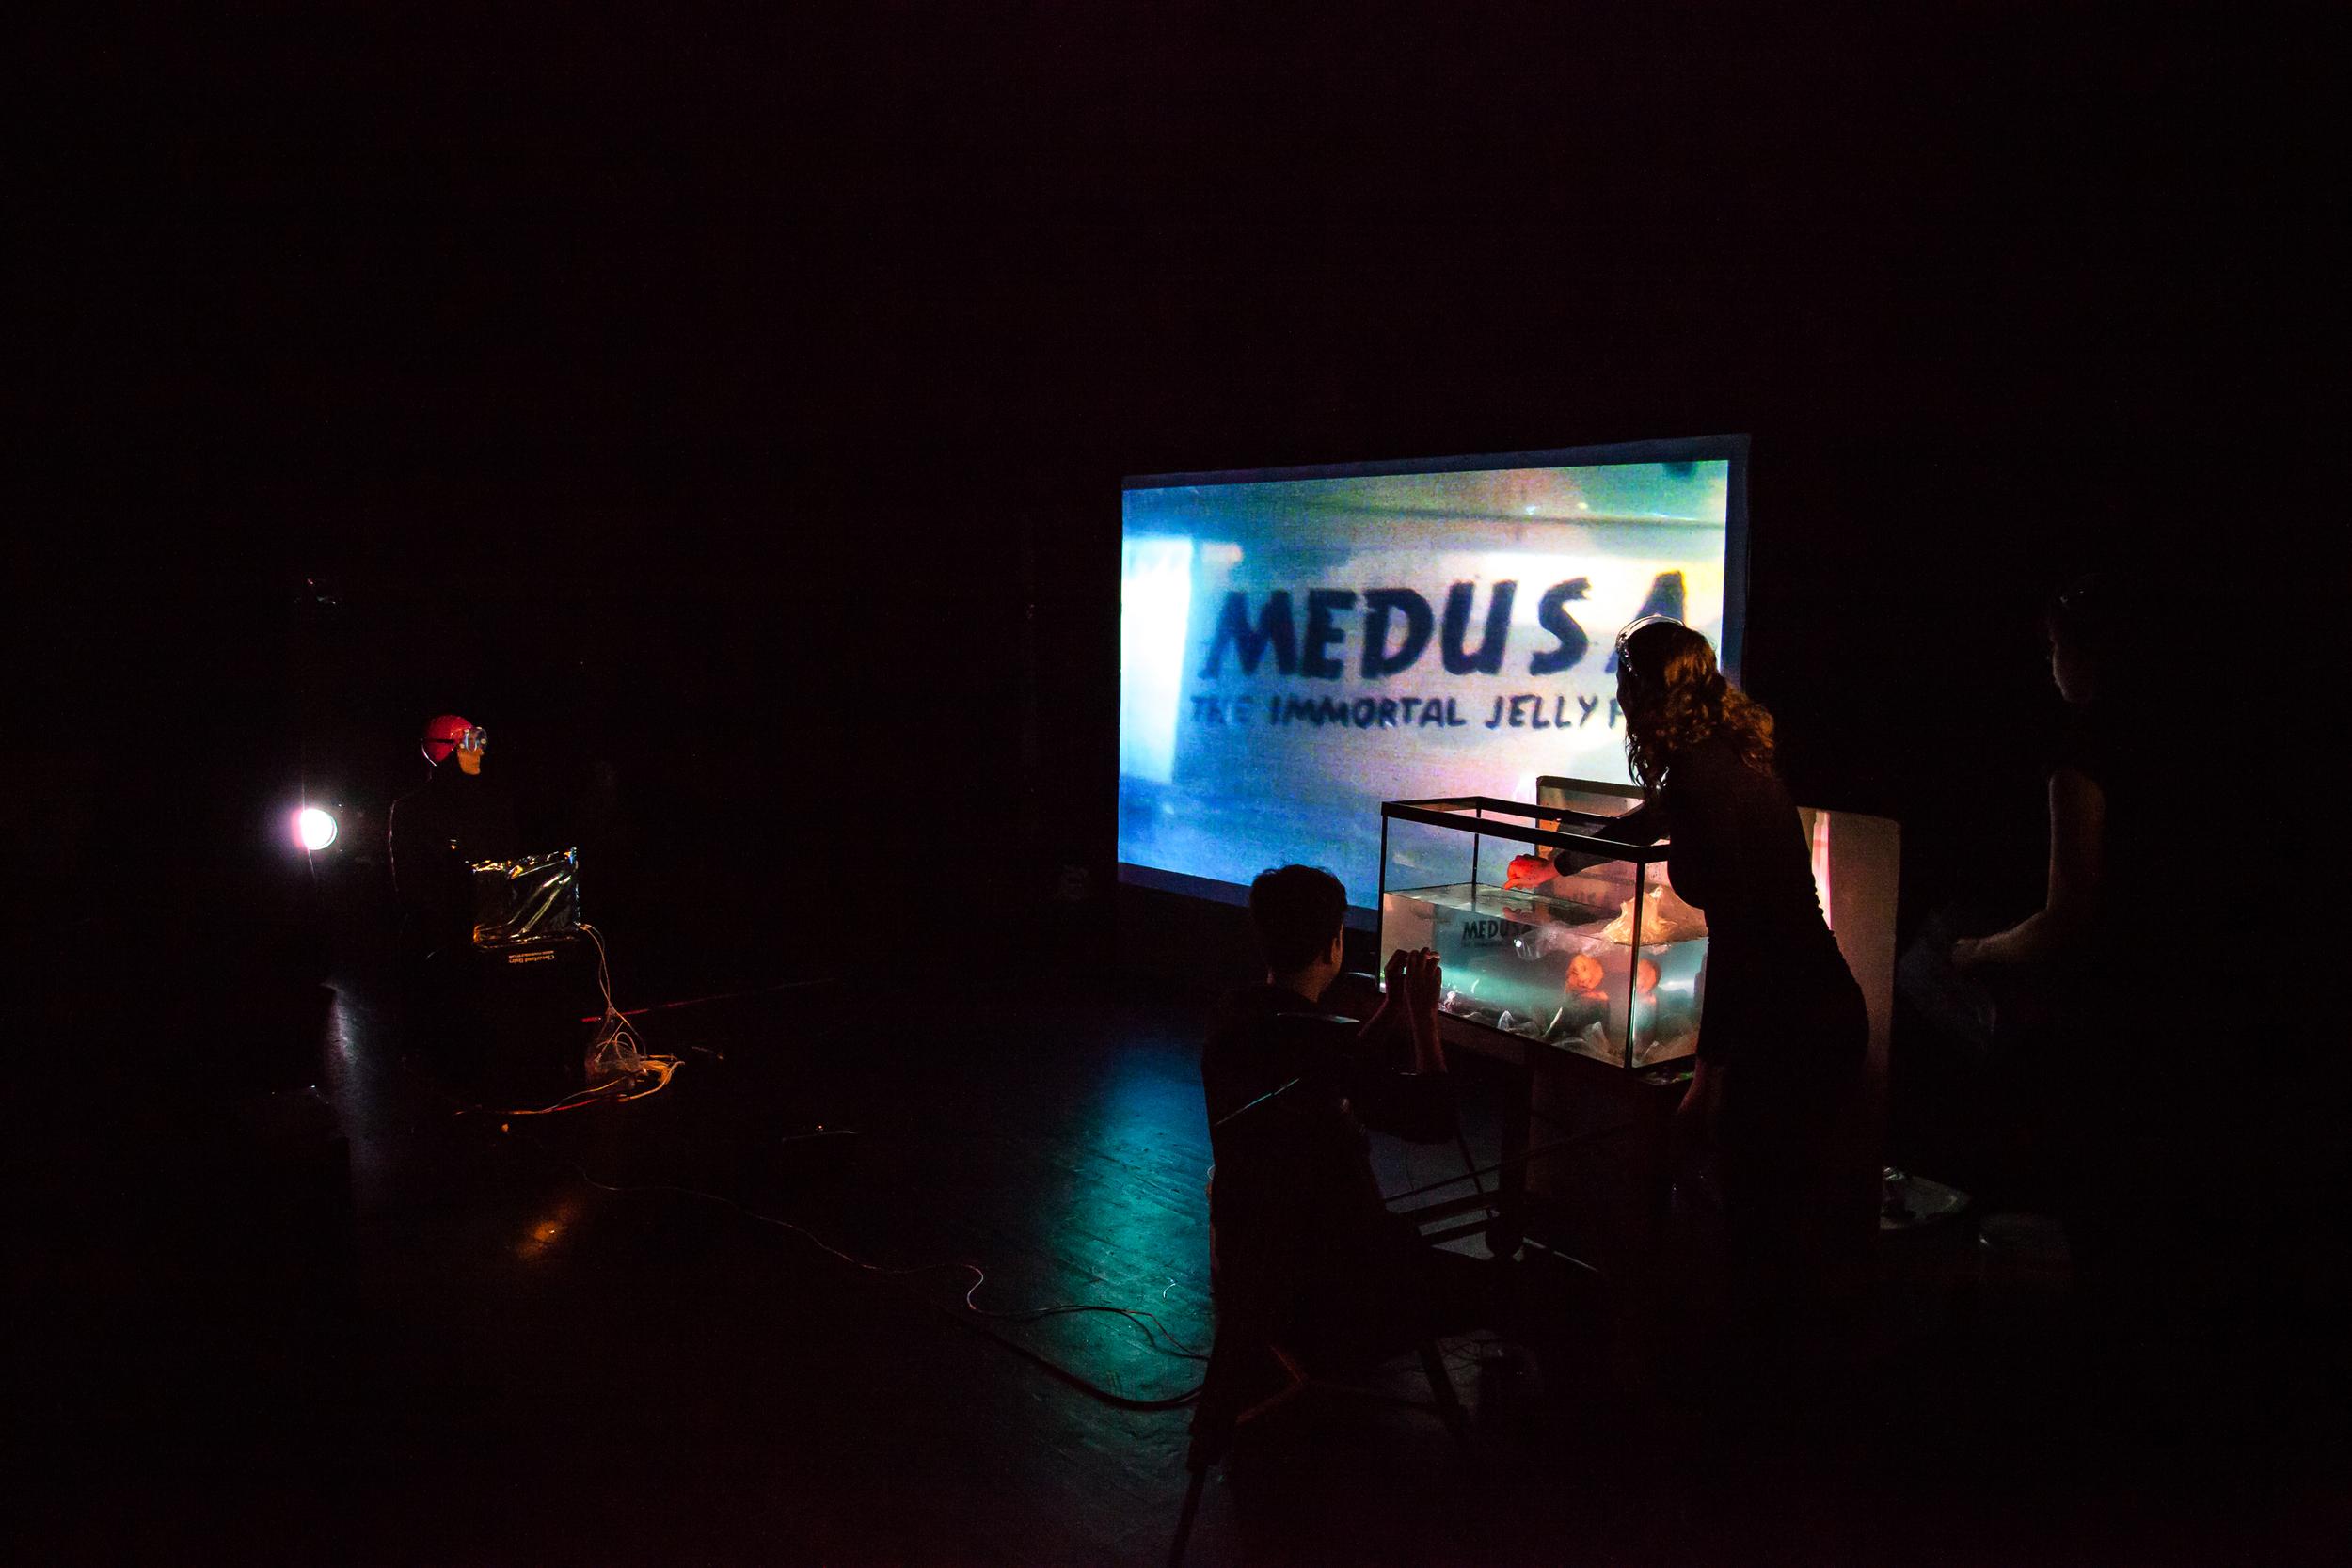 Medusa: The Immortal Jellyfish